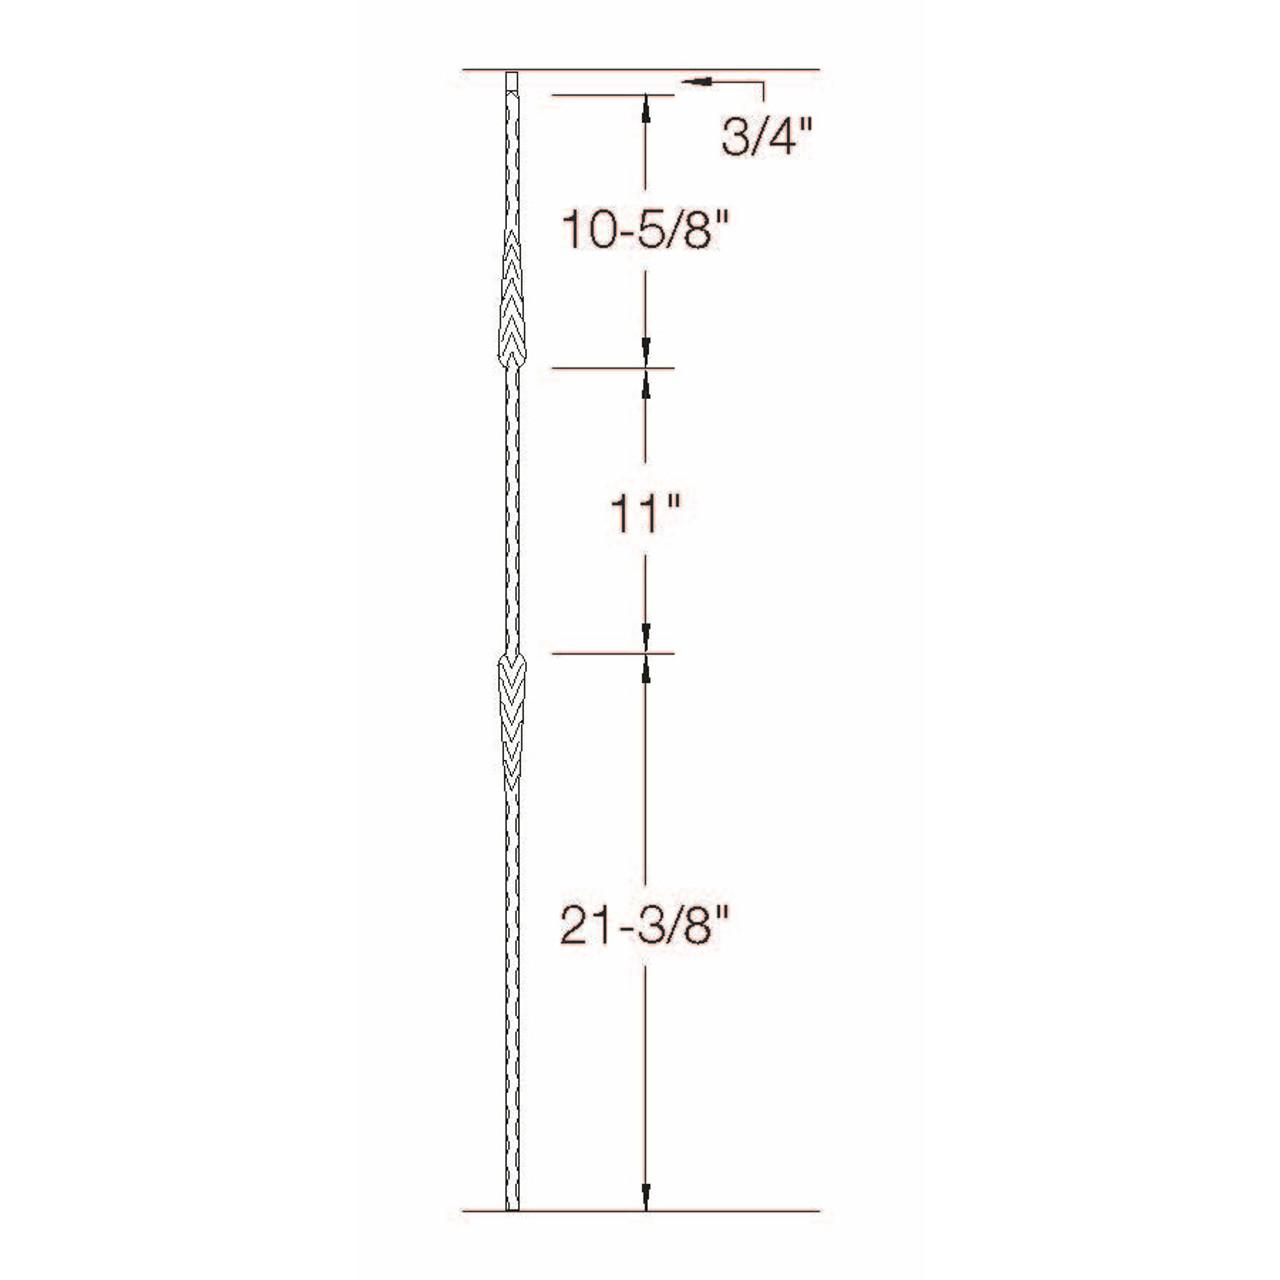 T-22 Split Arrows Edge Hammered TubDimensional Information